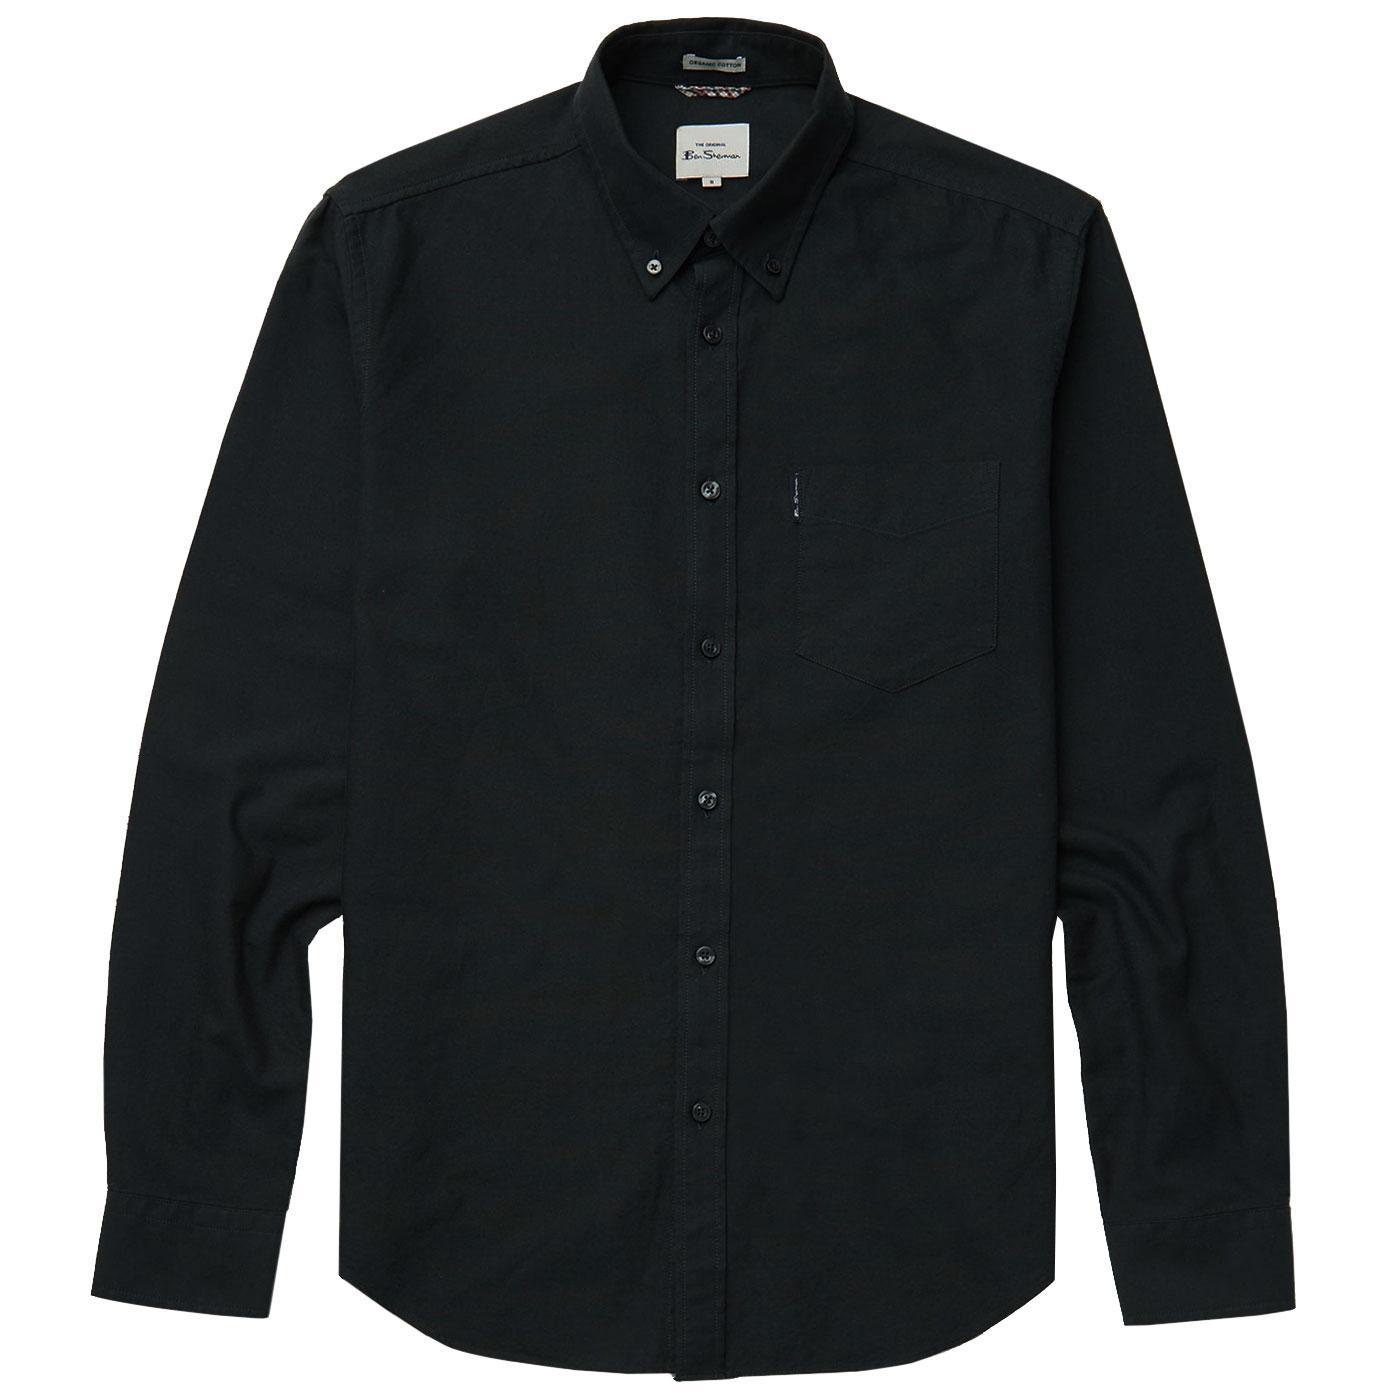 BEN SHERMAN Signature Button Down Oxford Shirt (B)